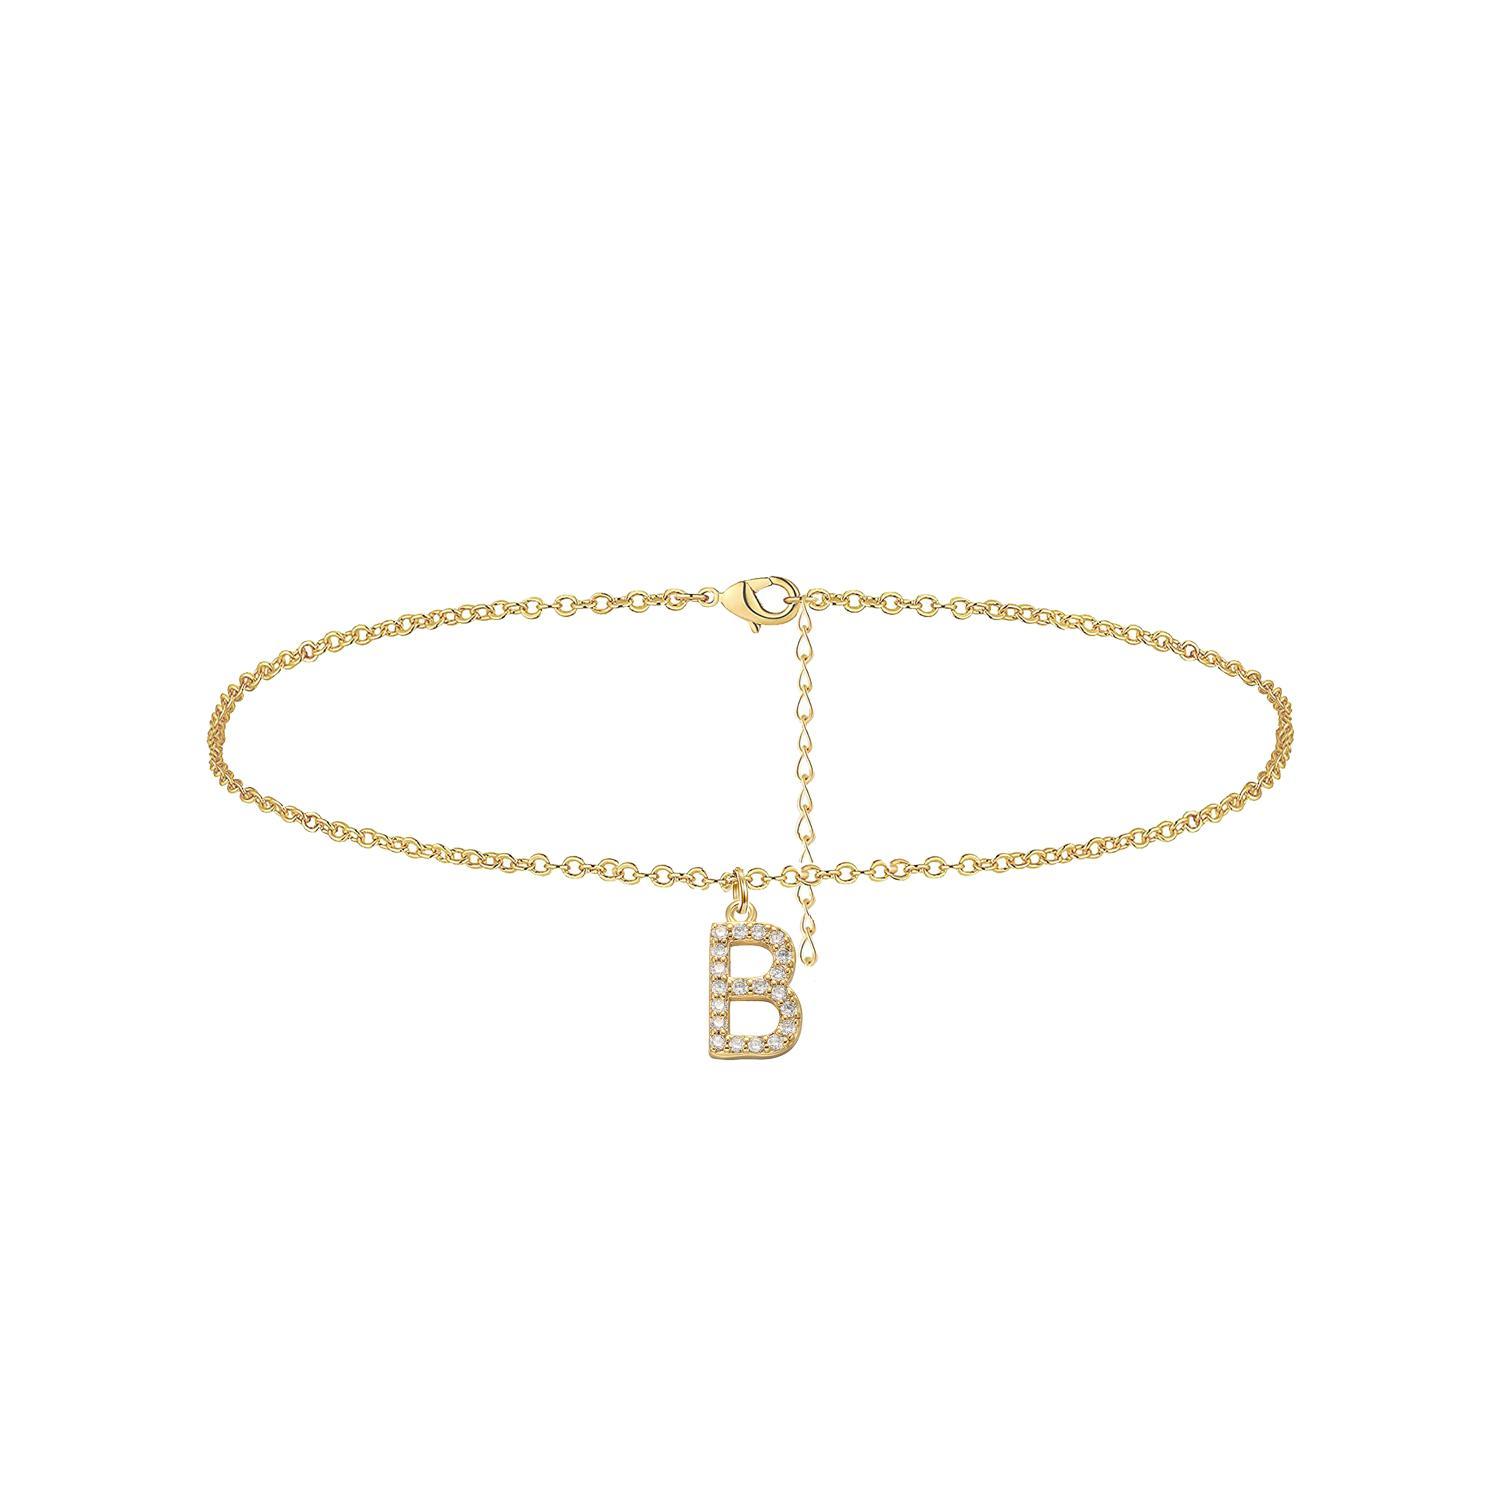 Tiny Dainty Kristall Inlay Anfangsbuchstabe-Charme-Armbänder für Mädchen Mode Schmuck Mutter-Geschenk 26 A-Z Letters Charm Bracelets